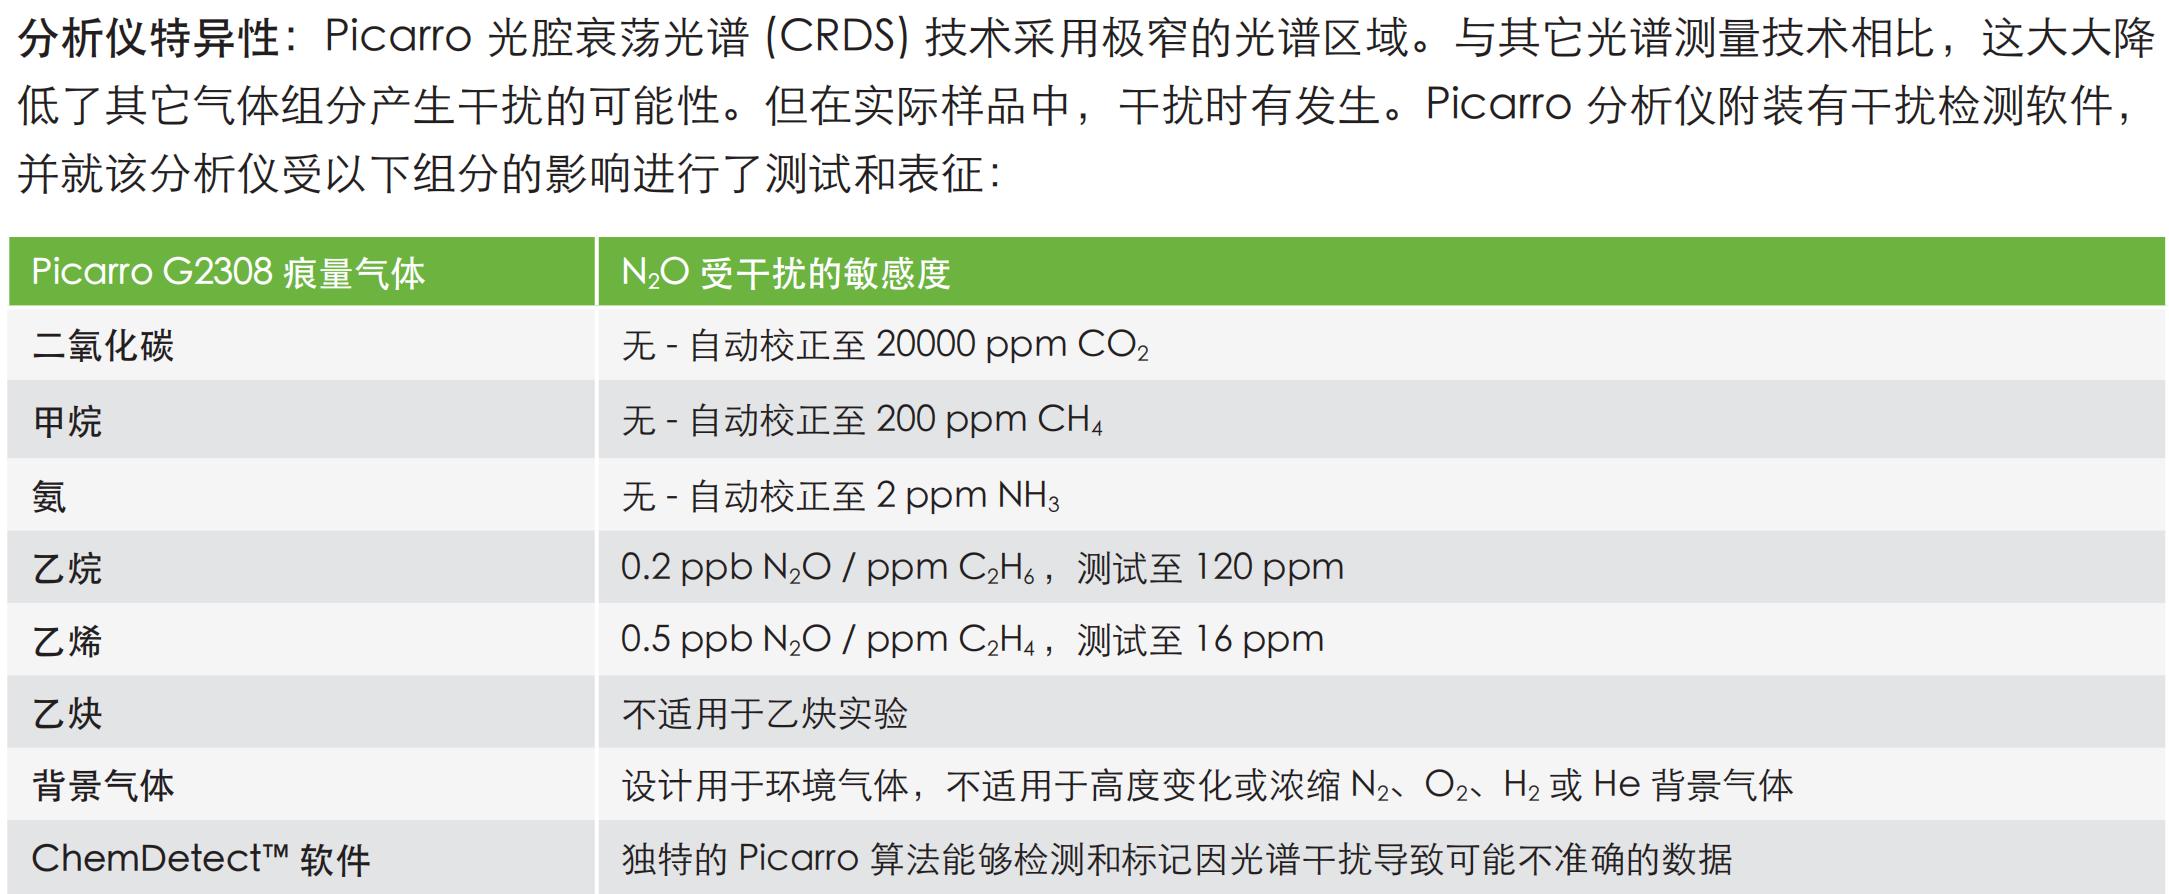 Picarro_G2308 Chinese Datasheet_000.png